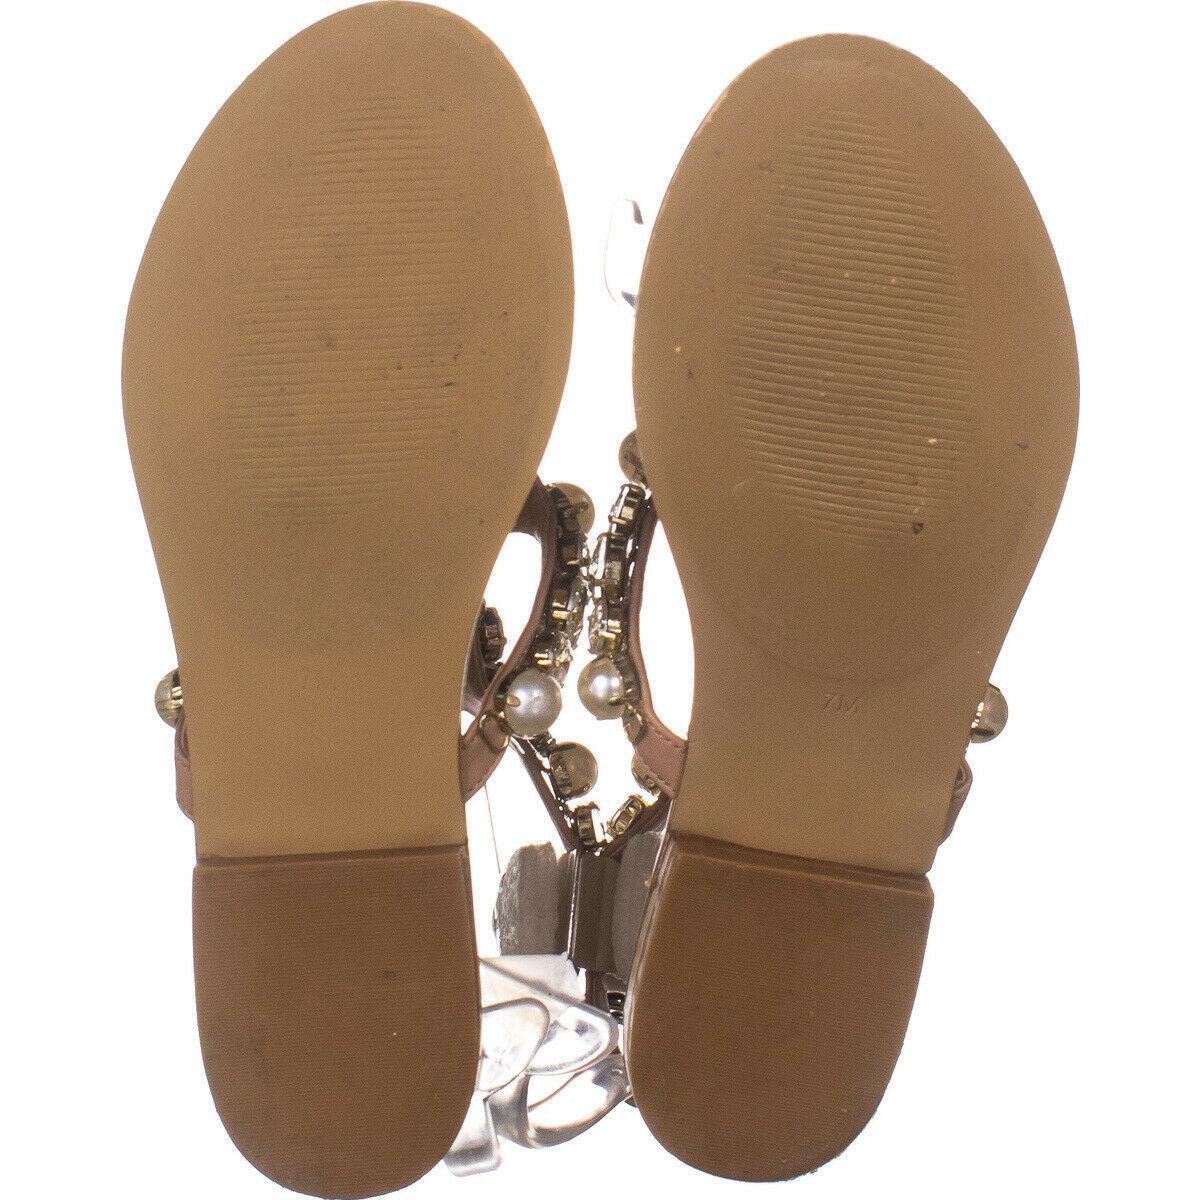 Steve Madden Chantel Flat Ankle Strap Sandals, Blush Multi 115, Blush Multi, 7 image 6